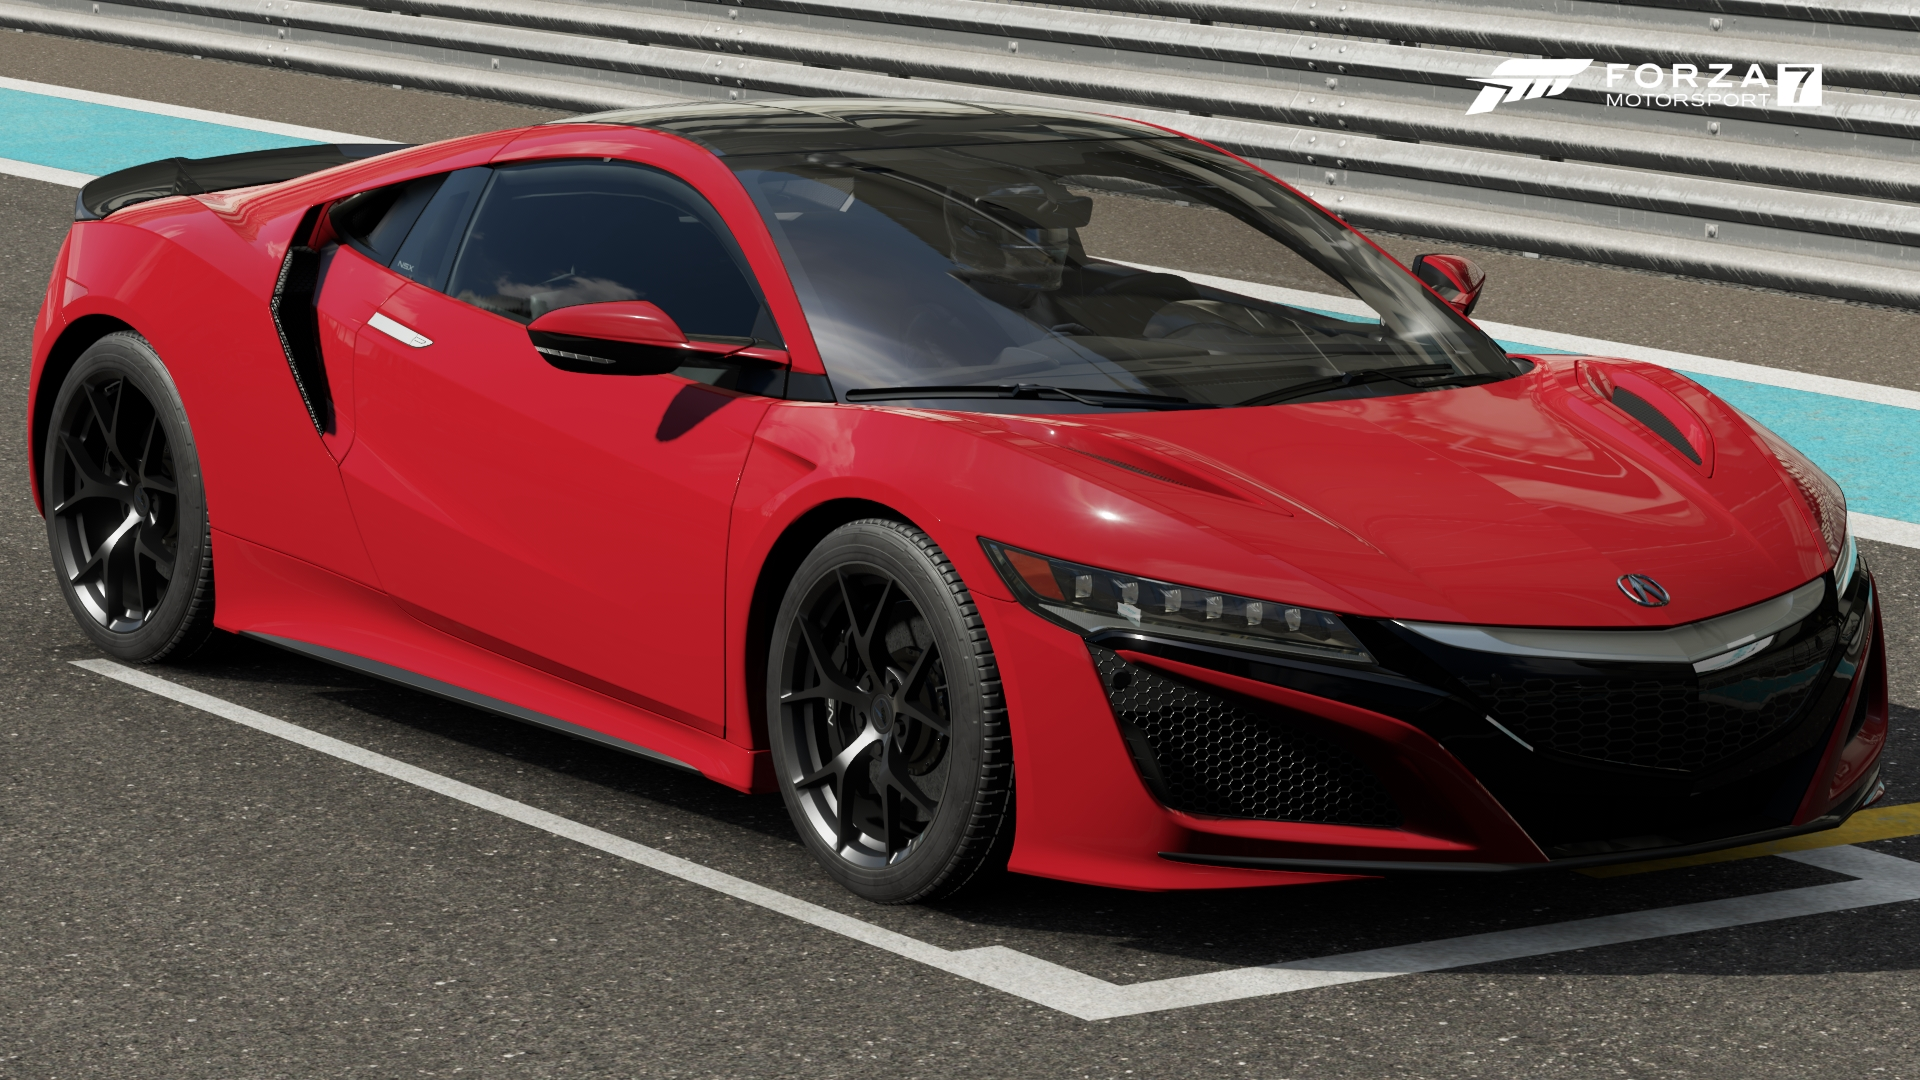 Acura NSX (2017) | Forza Motorsport Wiki | FANDOM powered ...